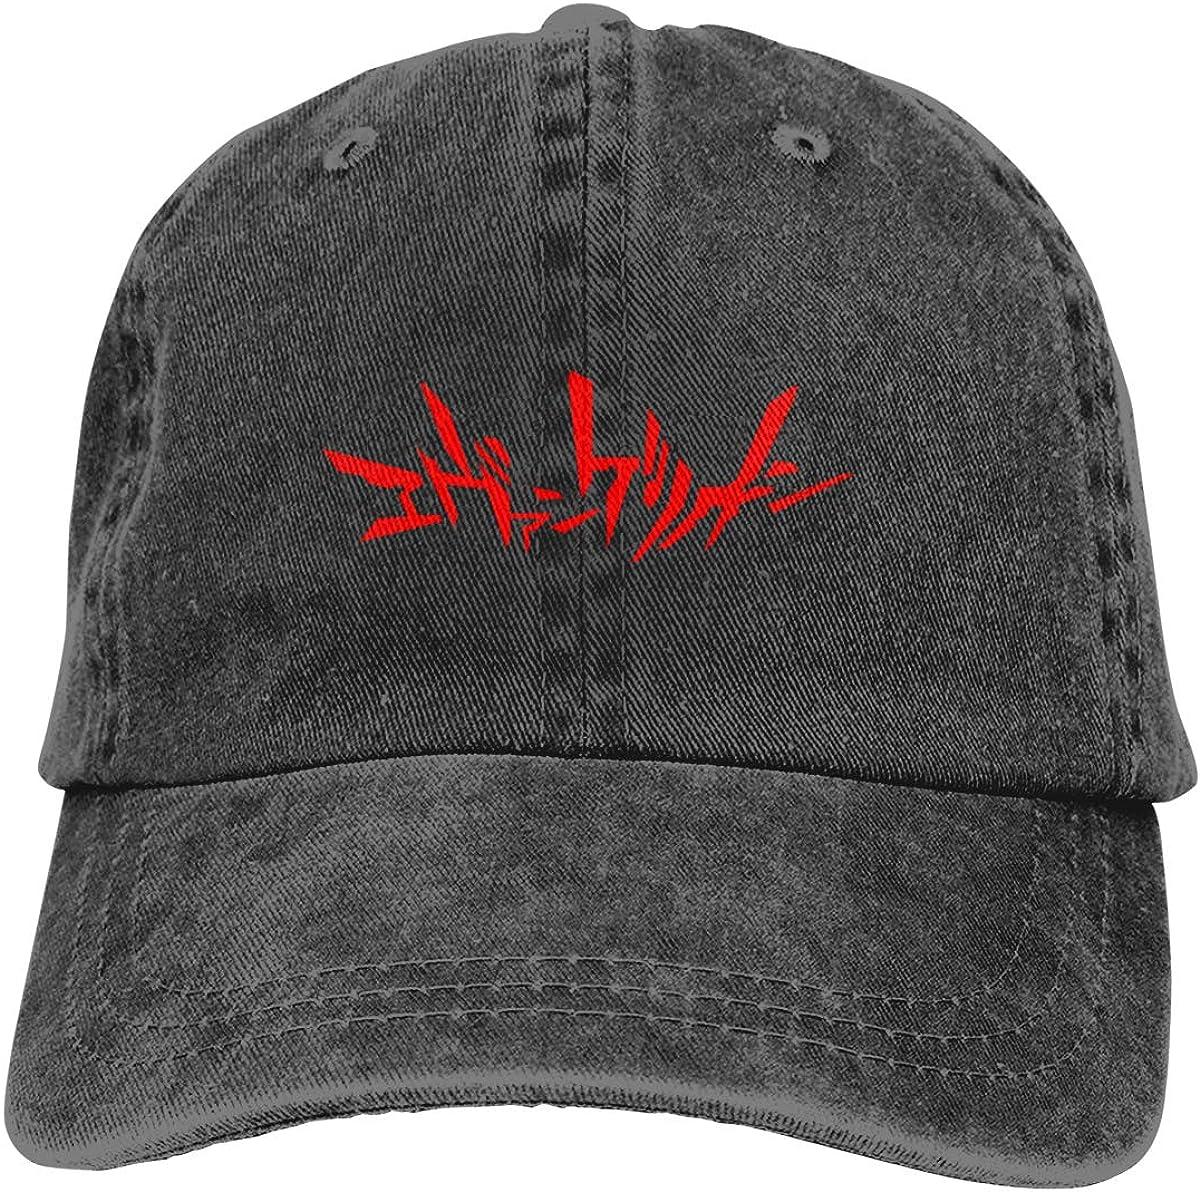 Neon Genesis Evangelion Hat Adult Adjustable Sun Vintage Washed Denim Caps Hats for Outdoor